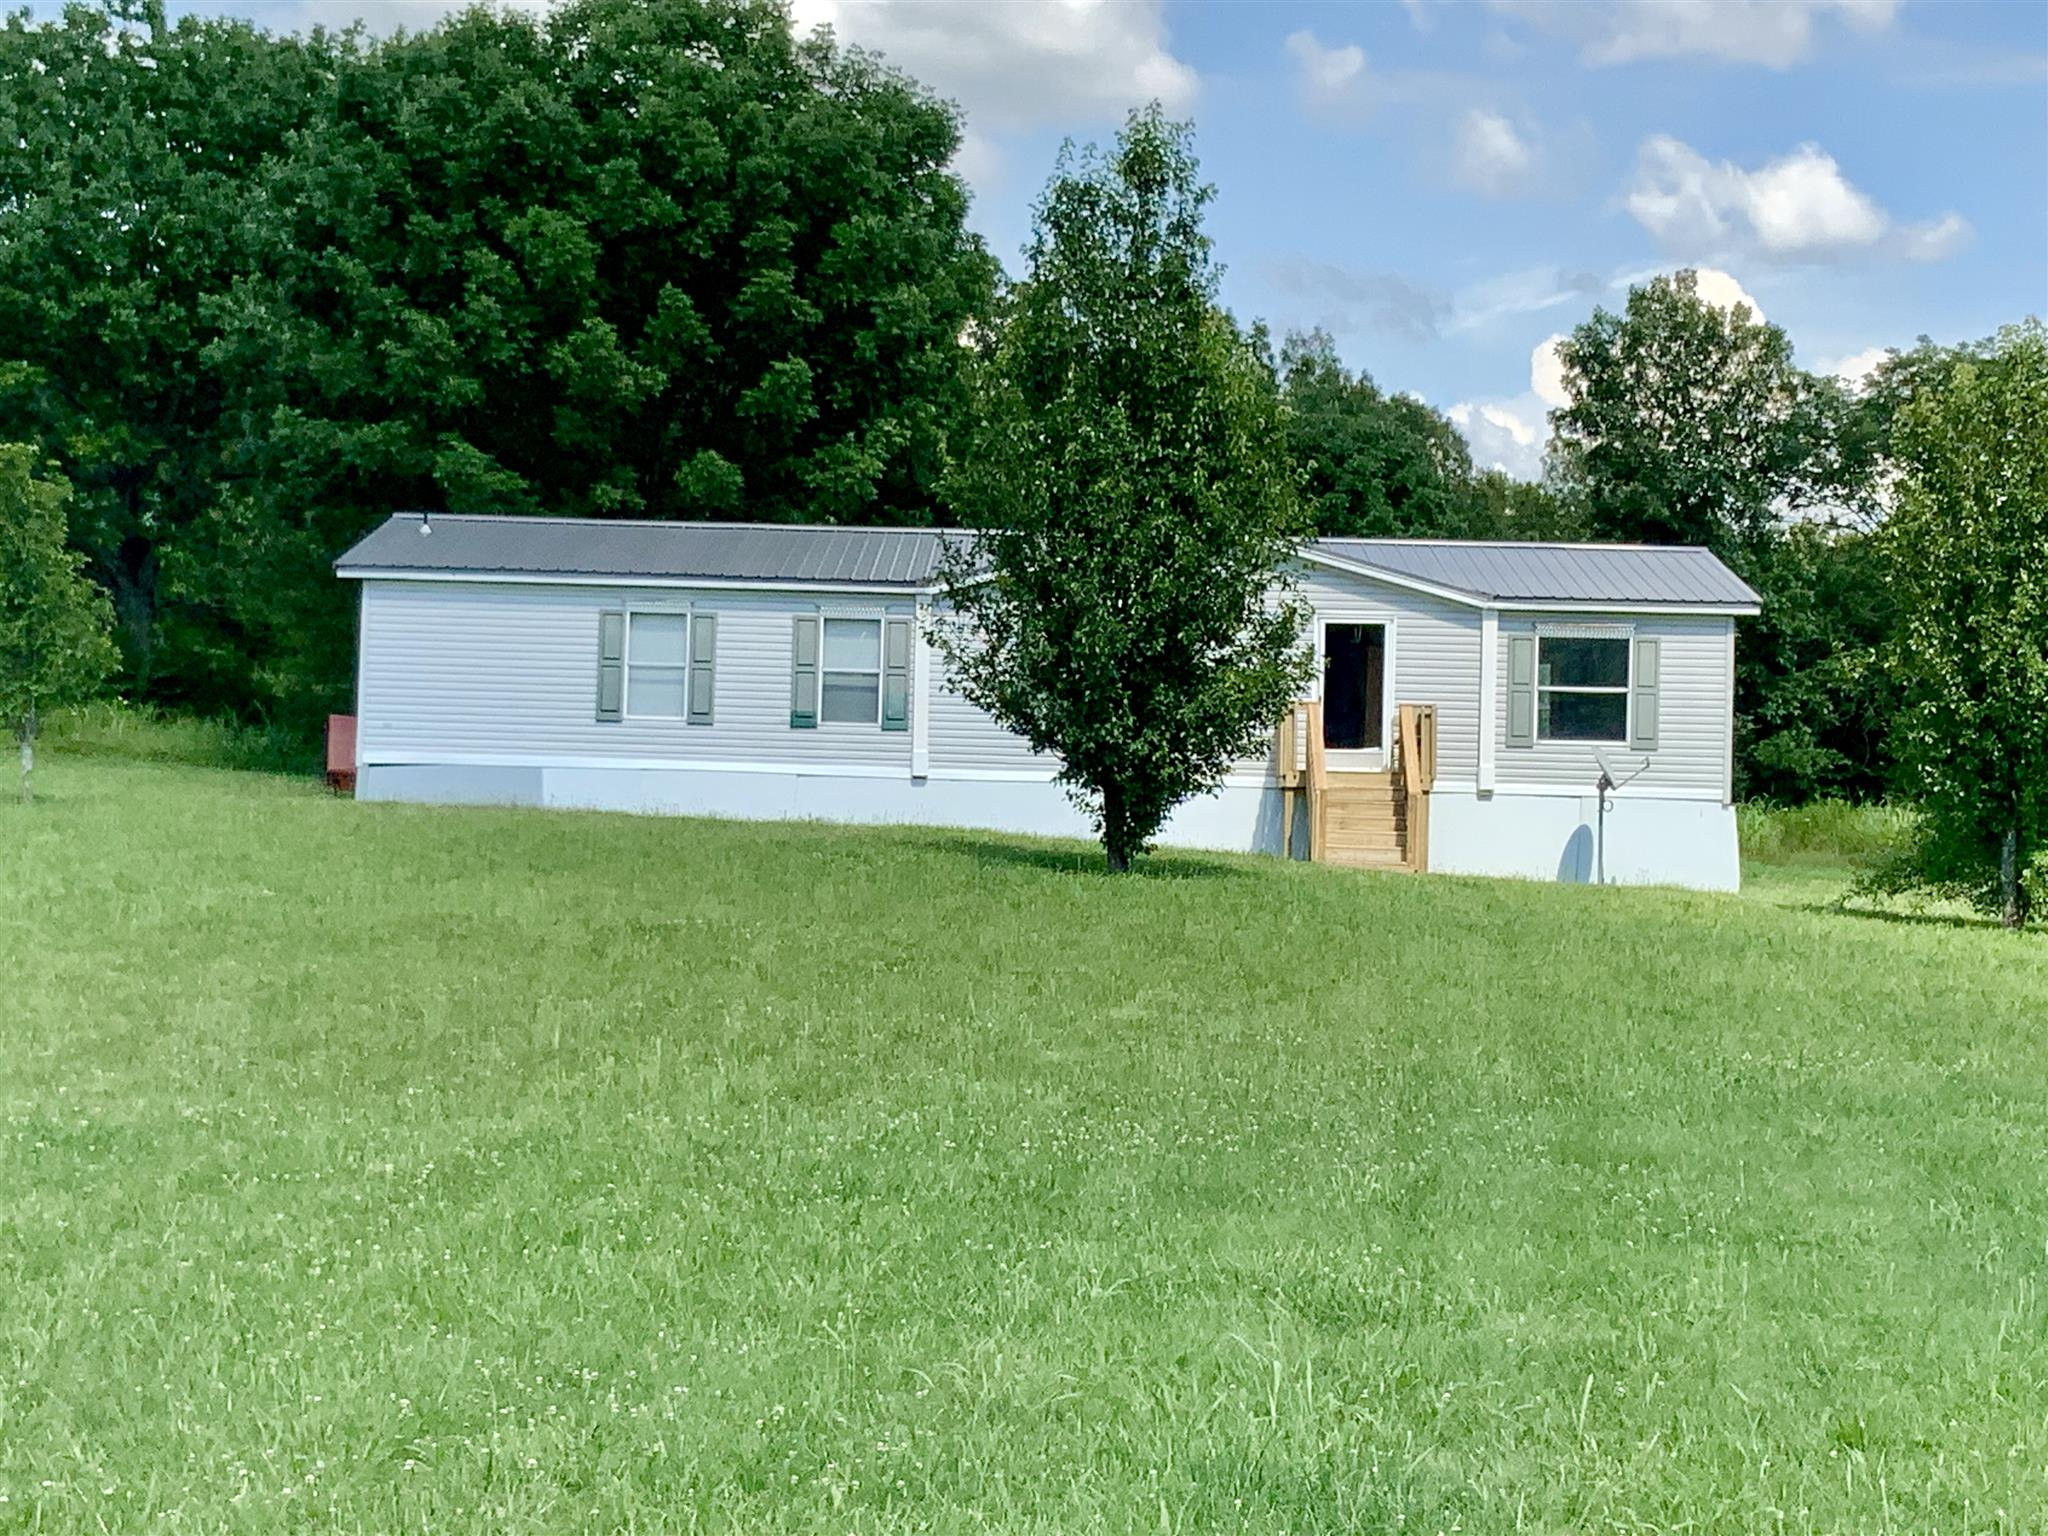 3121 Warner Rd, Lewisburg, TN 37091 - Lewisburg, TN real estate listing